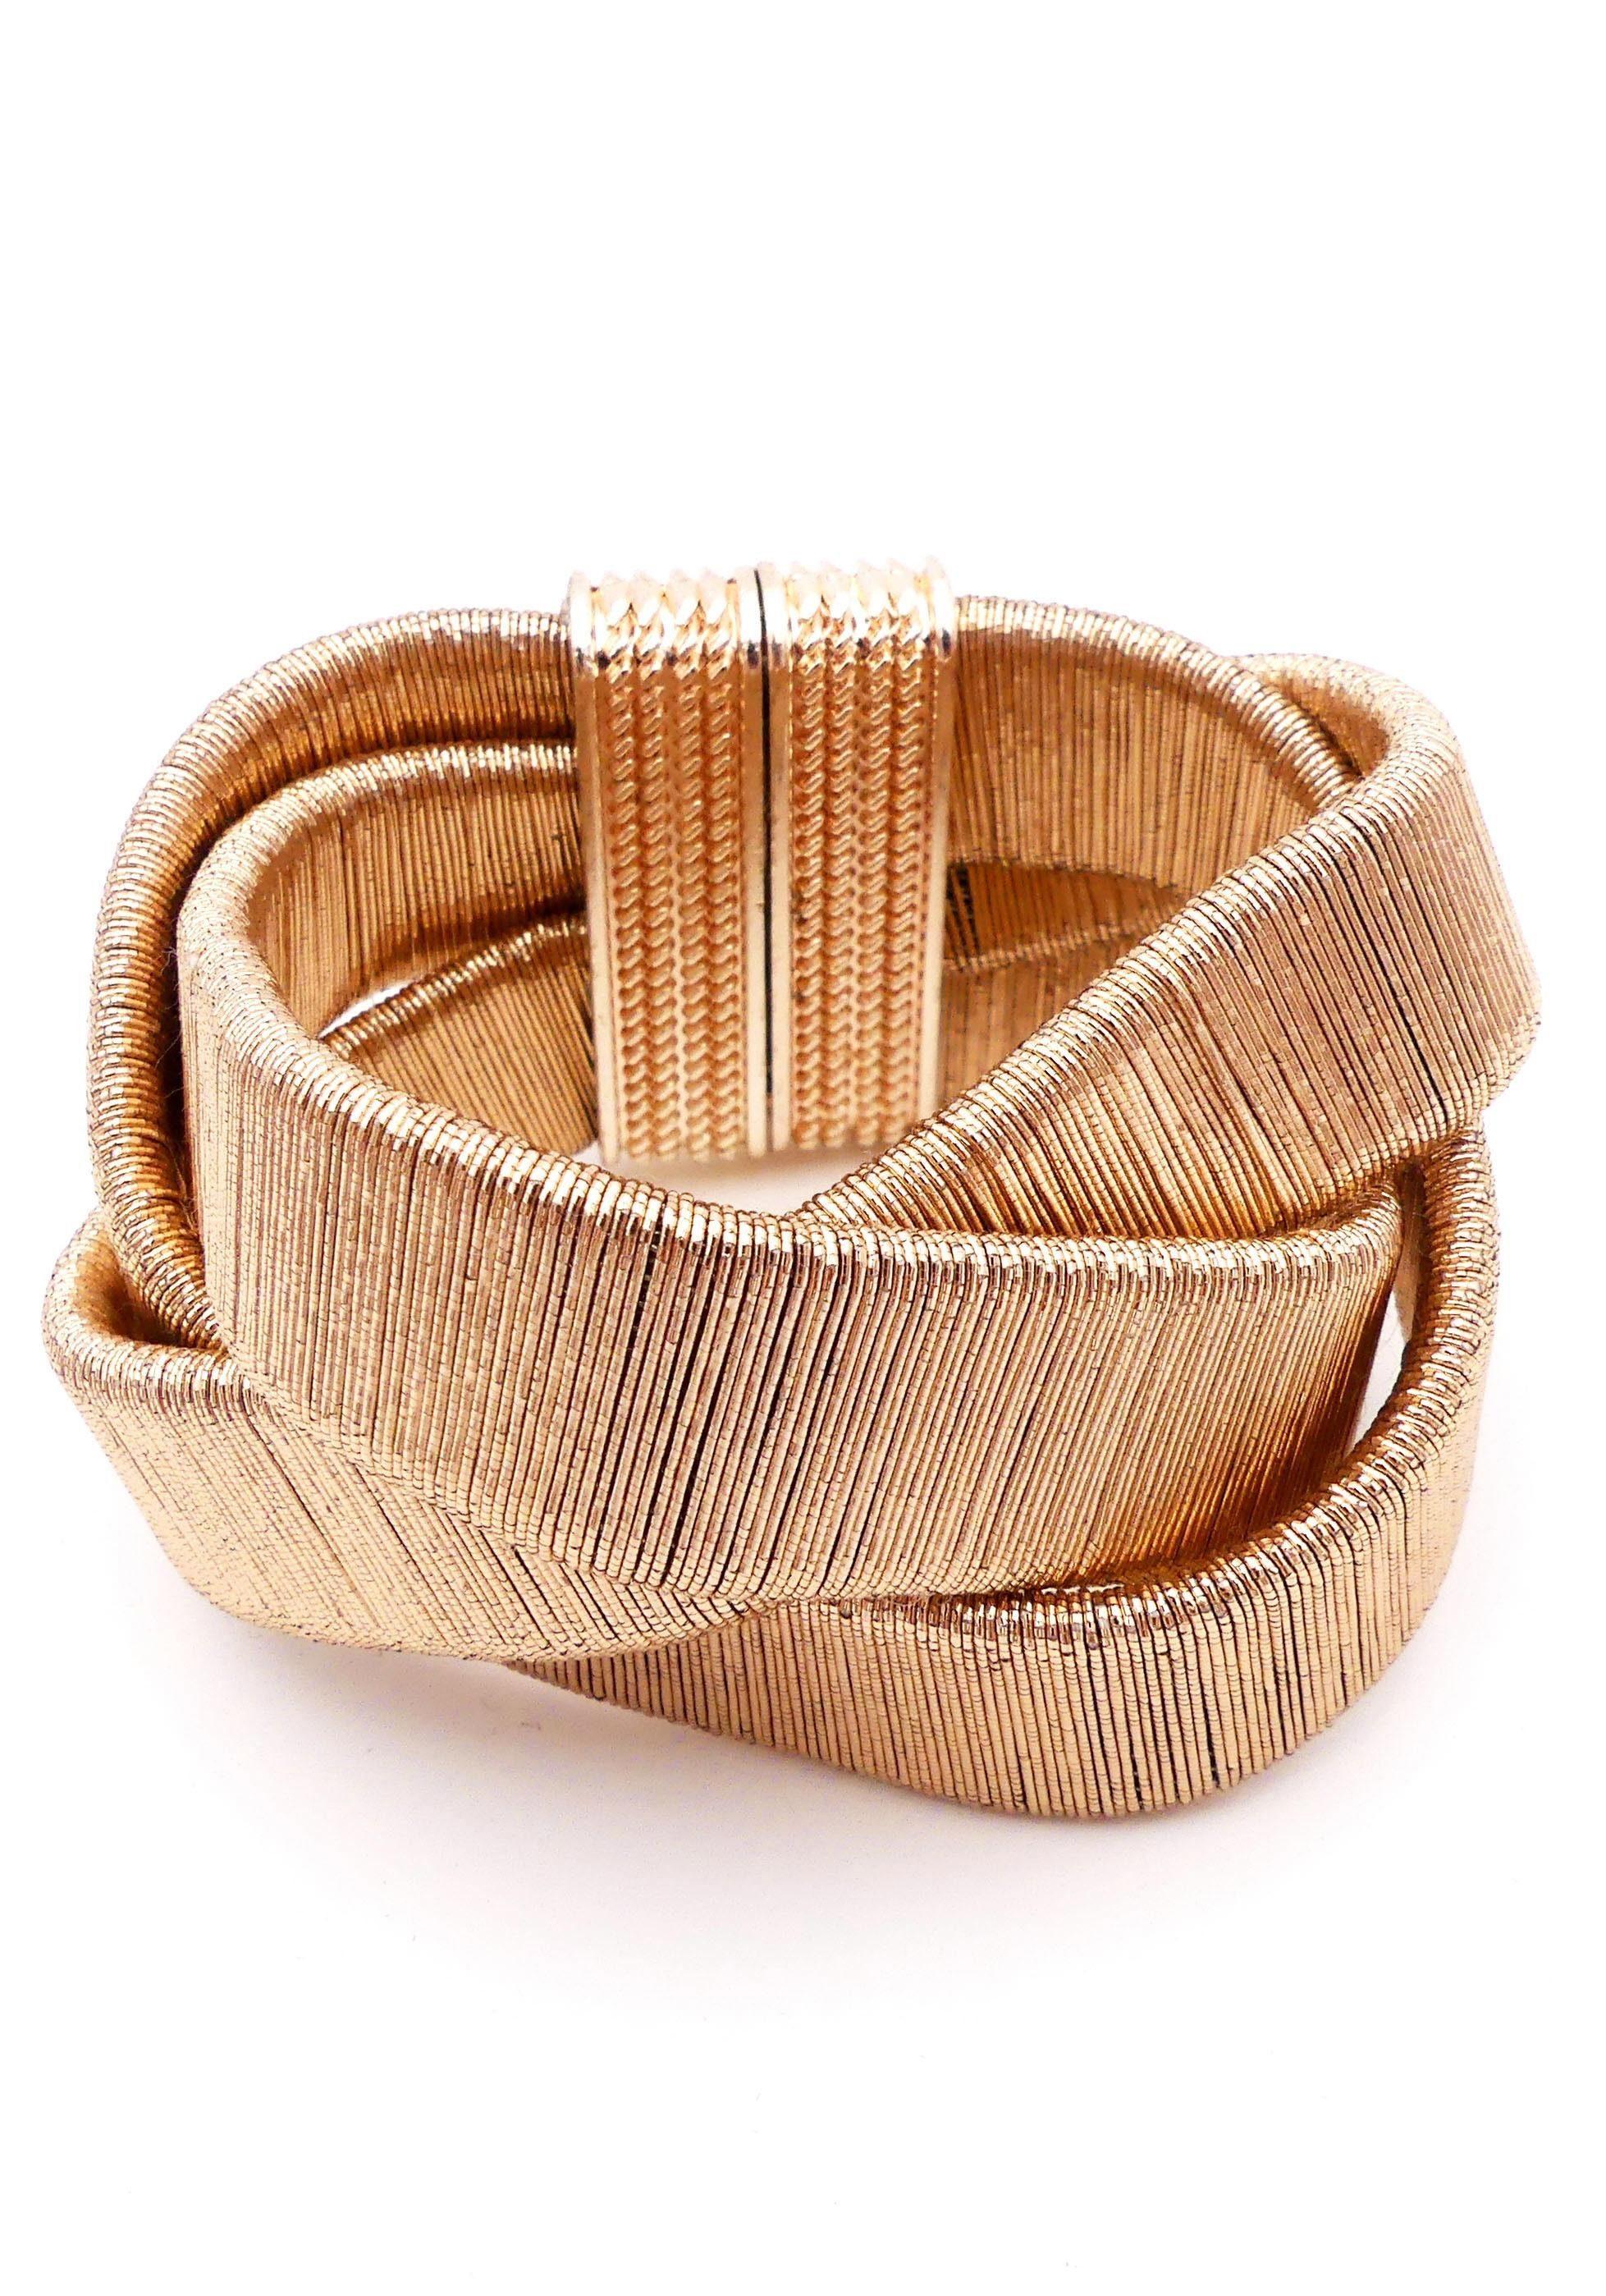 JJayz Armband im geflochtenem Design vergoldet | Schmuck > Armbänder > Goldarmbänder | J.Jayz